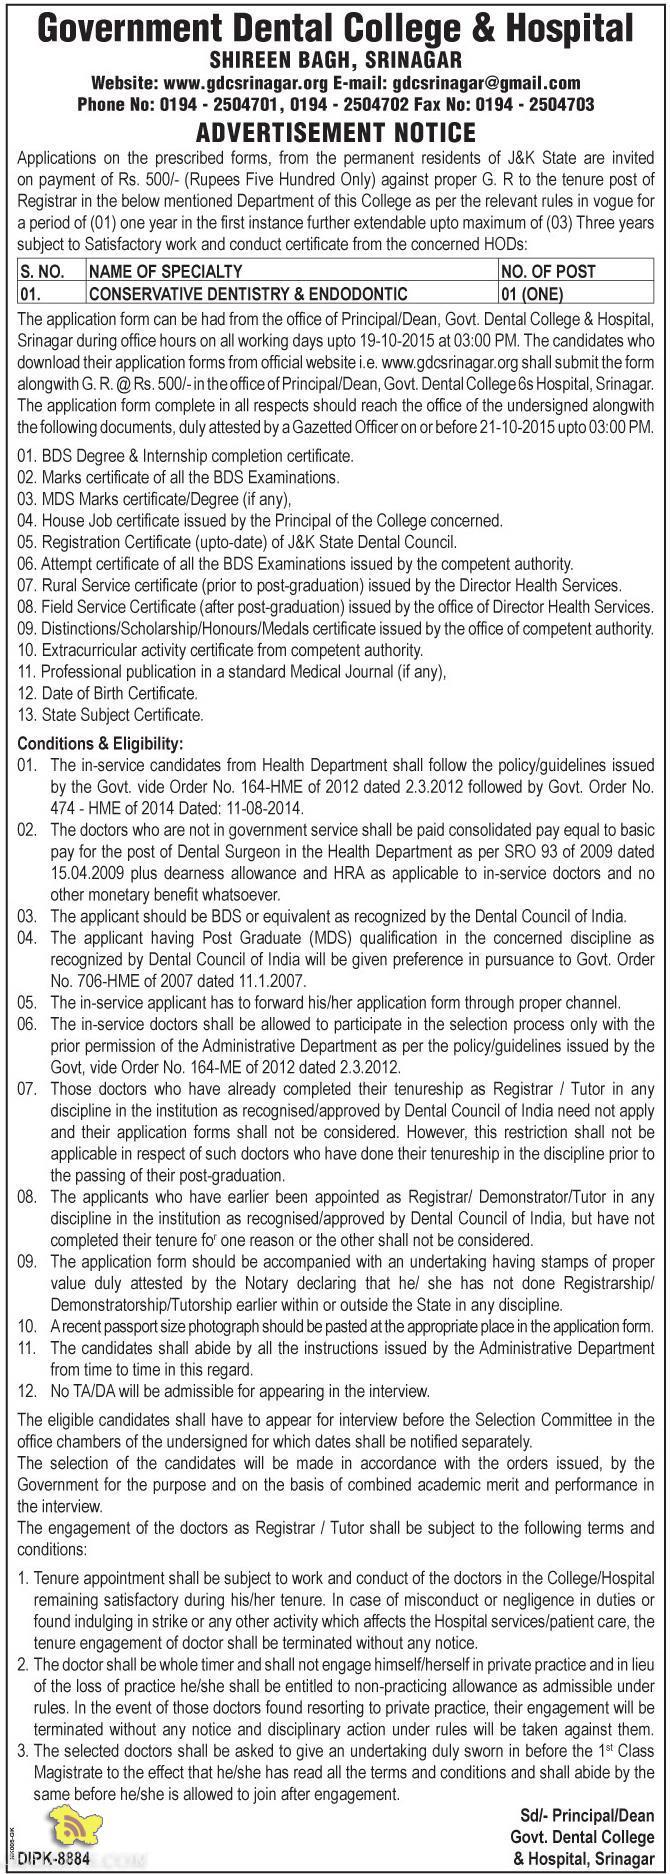 CONSERVATIVE DENTISTRY & ENDODONTIC JOB IN DENTAL COLLEGE, Govt jobs in srinagar, Employment news srinagar 2015, jobs in govt dental college srinagar